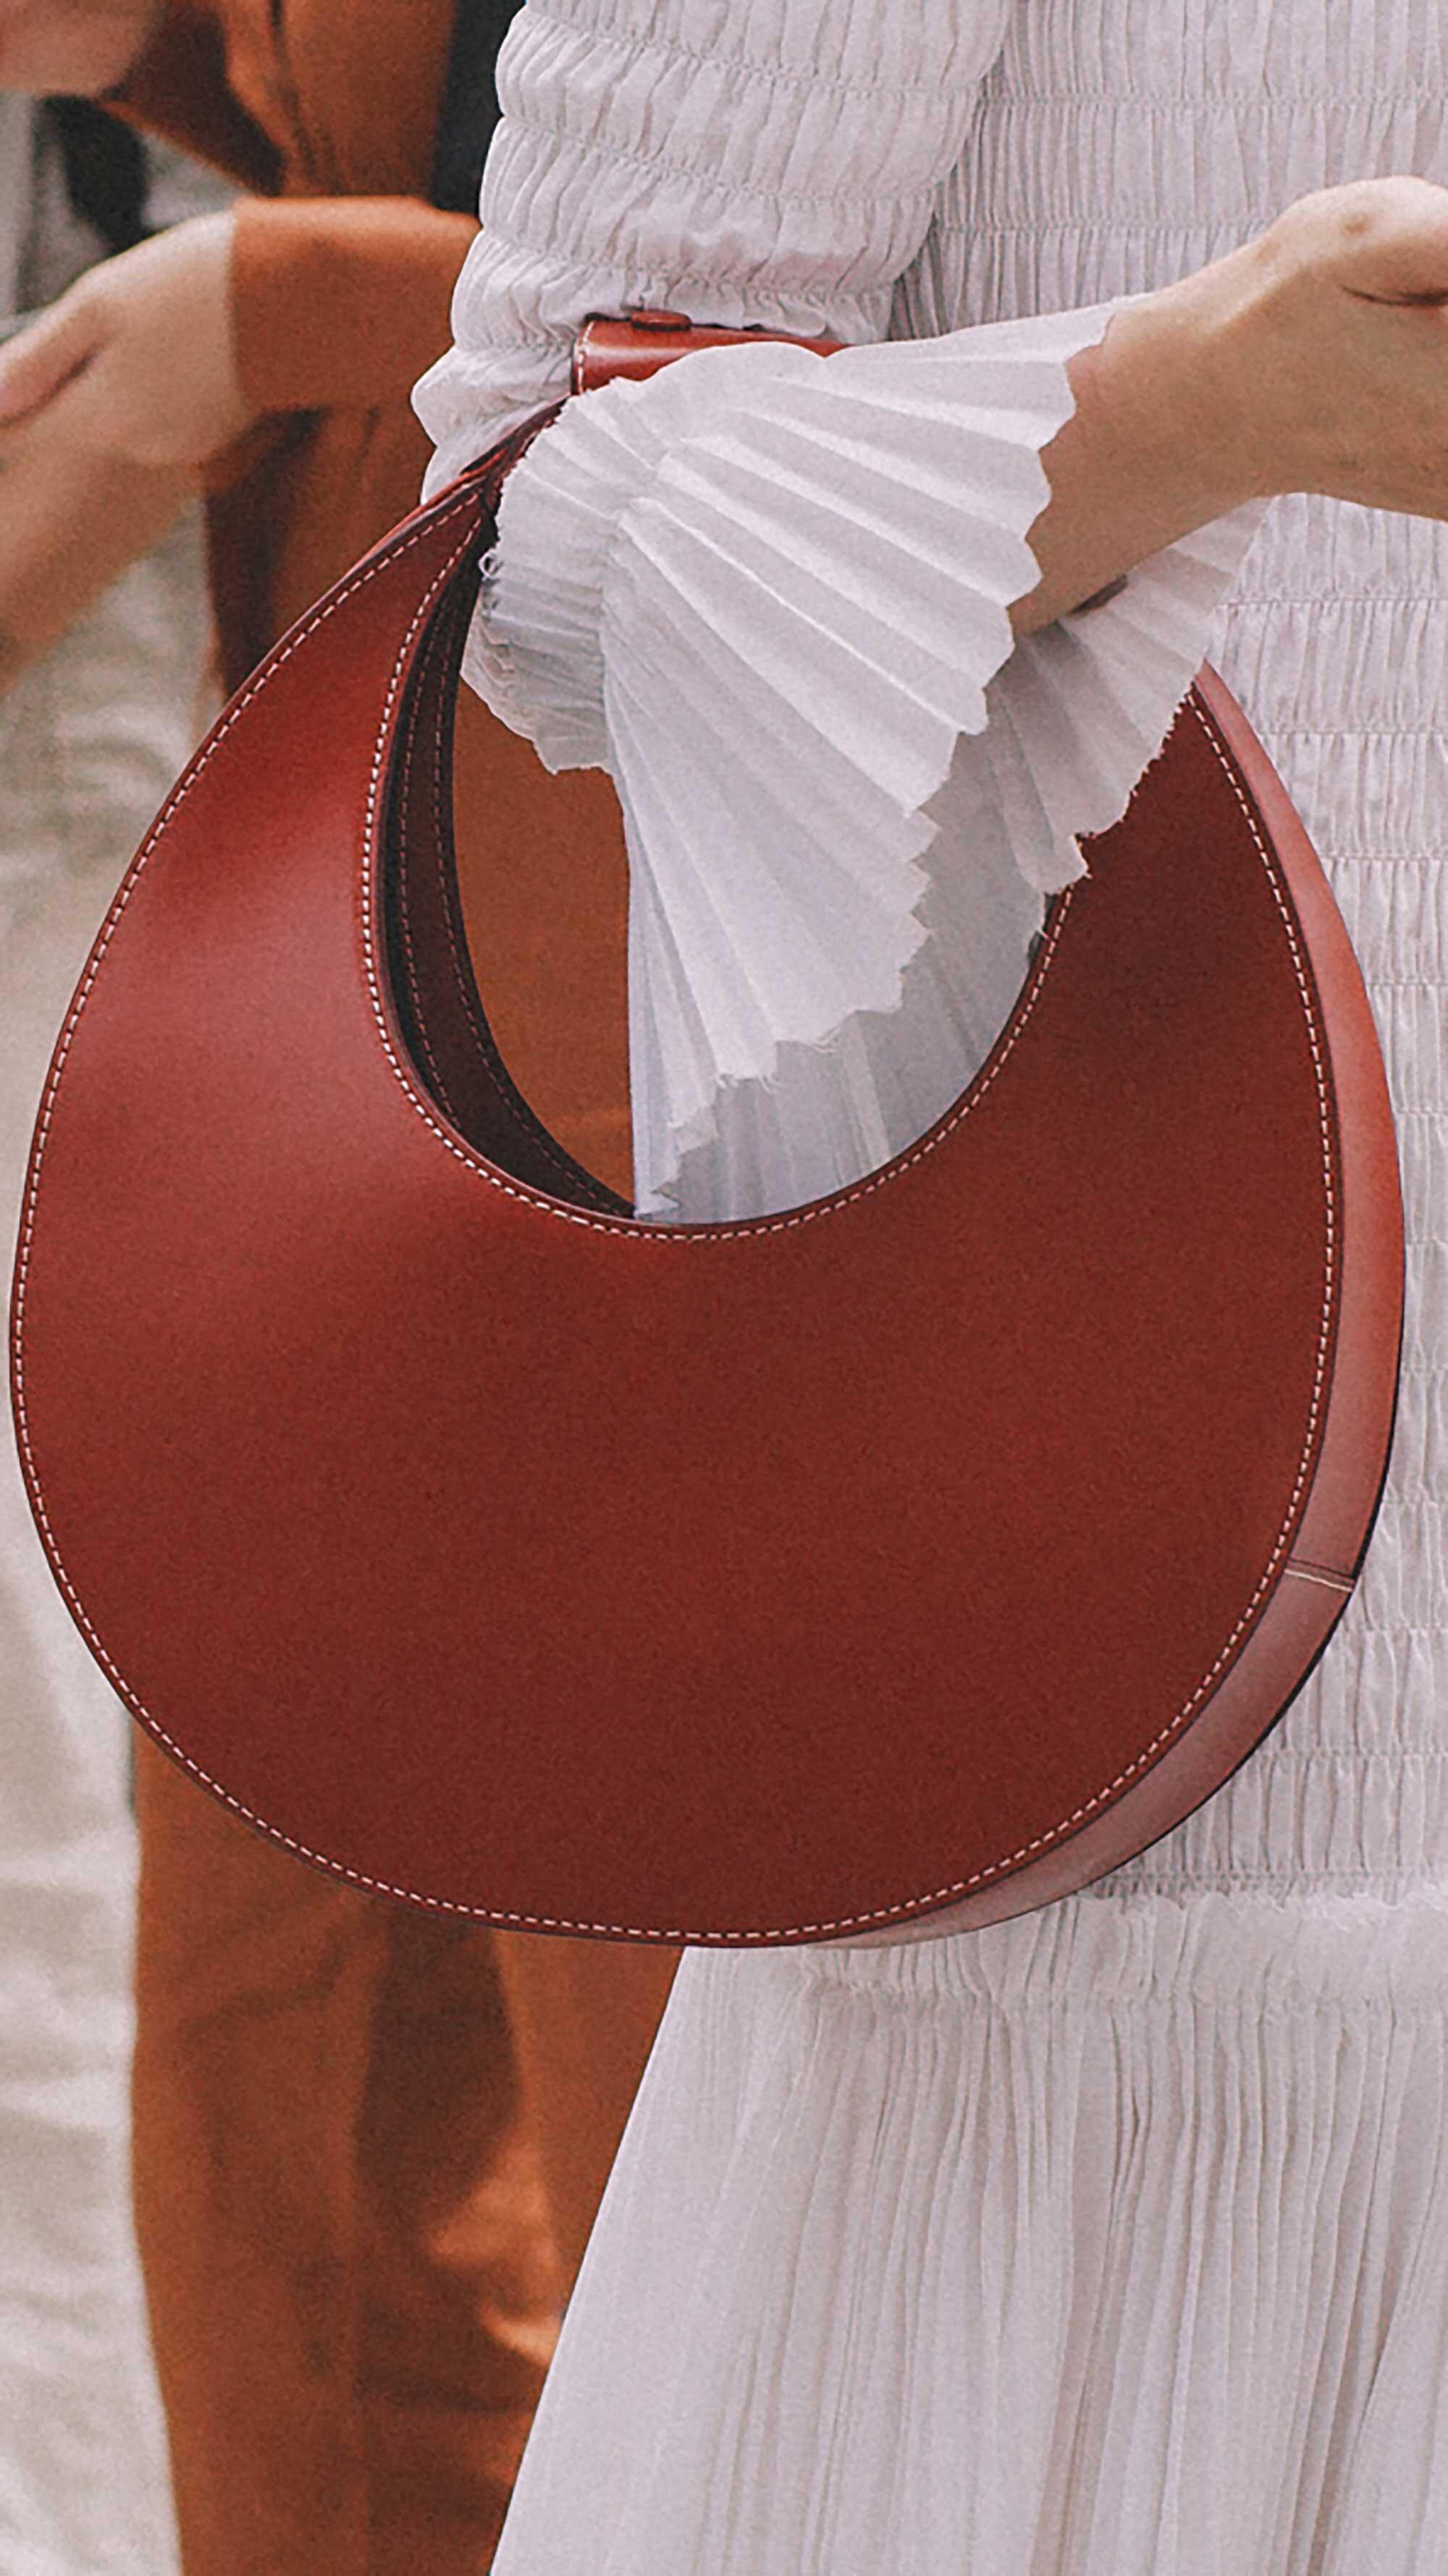 2. STAUD - Moon leather tote